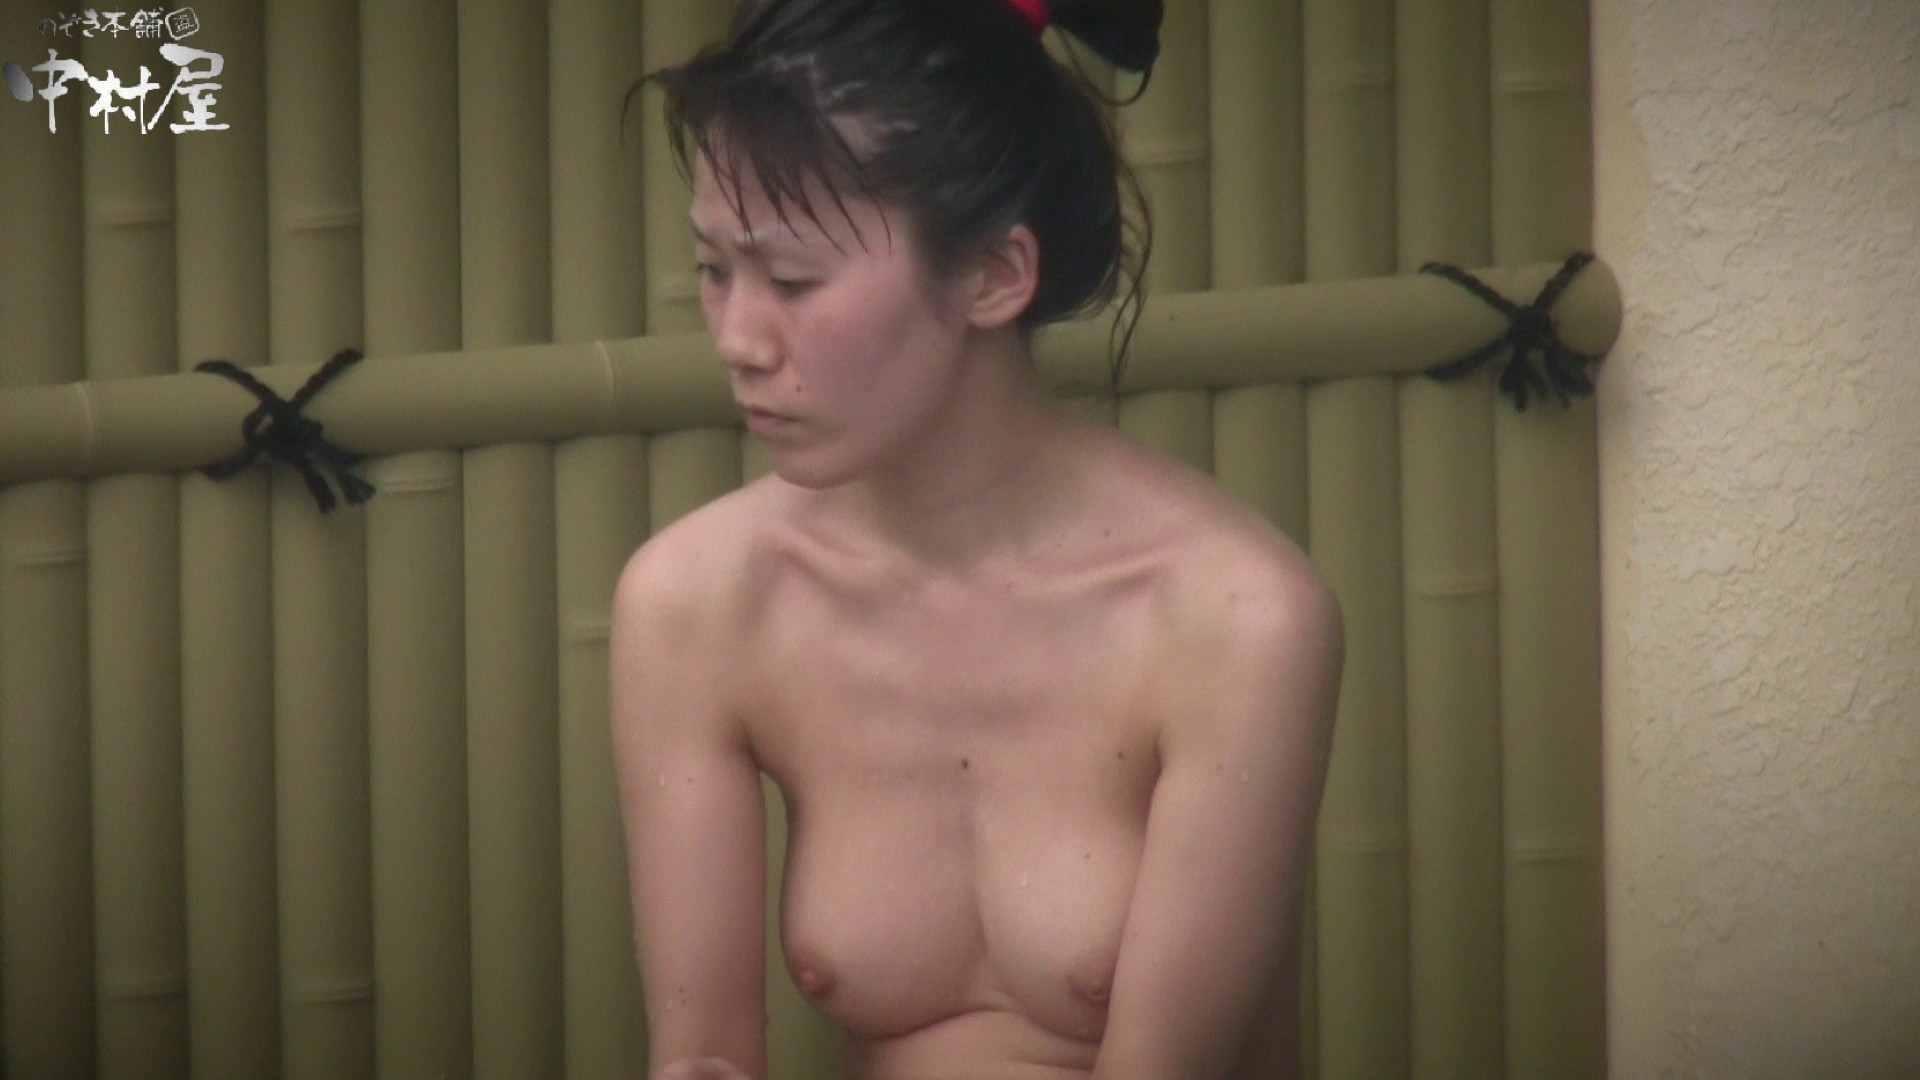 Aquaな露天風呂Vol.896 盗撮   HなOL  69pic 40